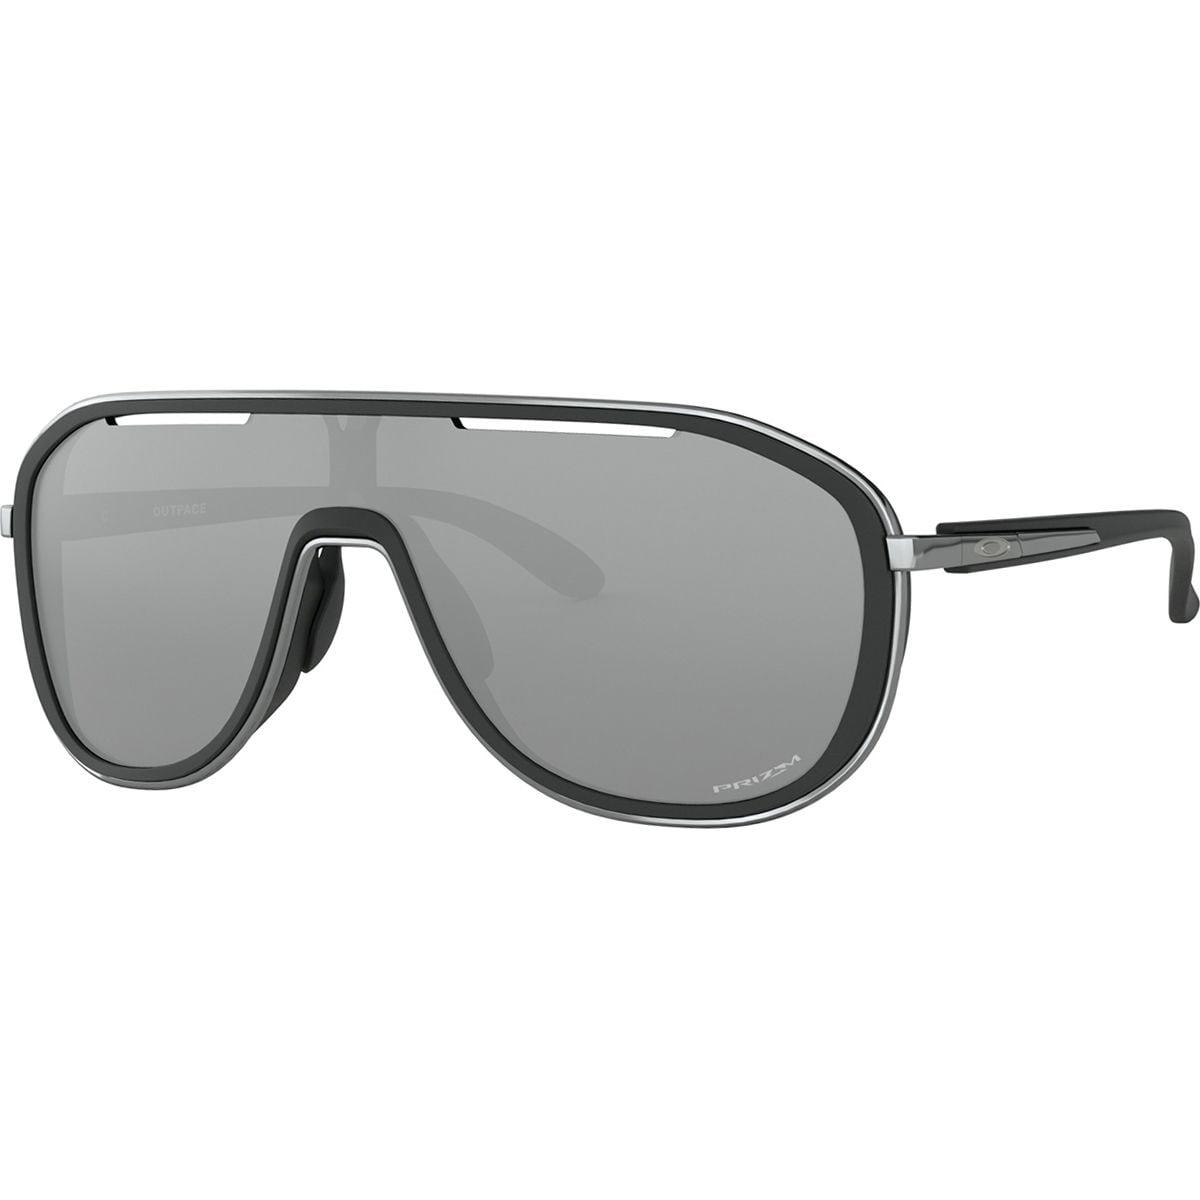 Oakley Outspace Prizm Sunglasses - Women's